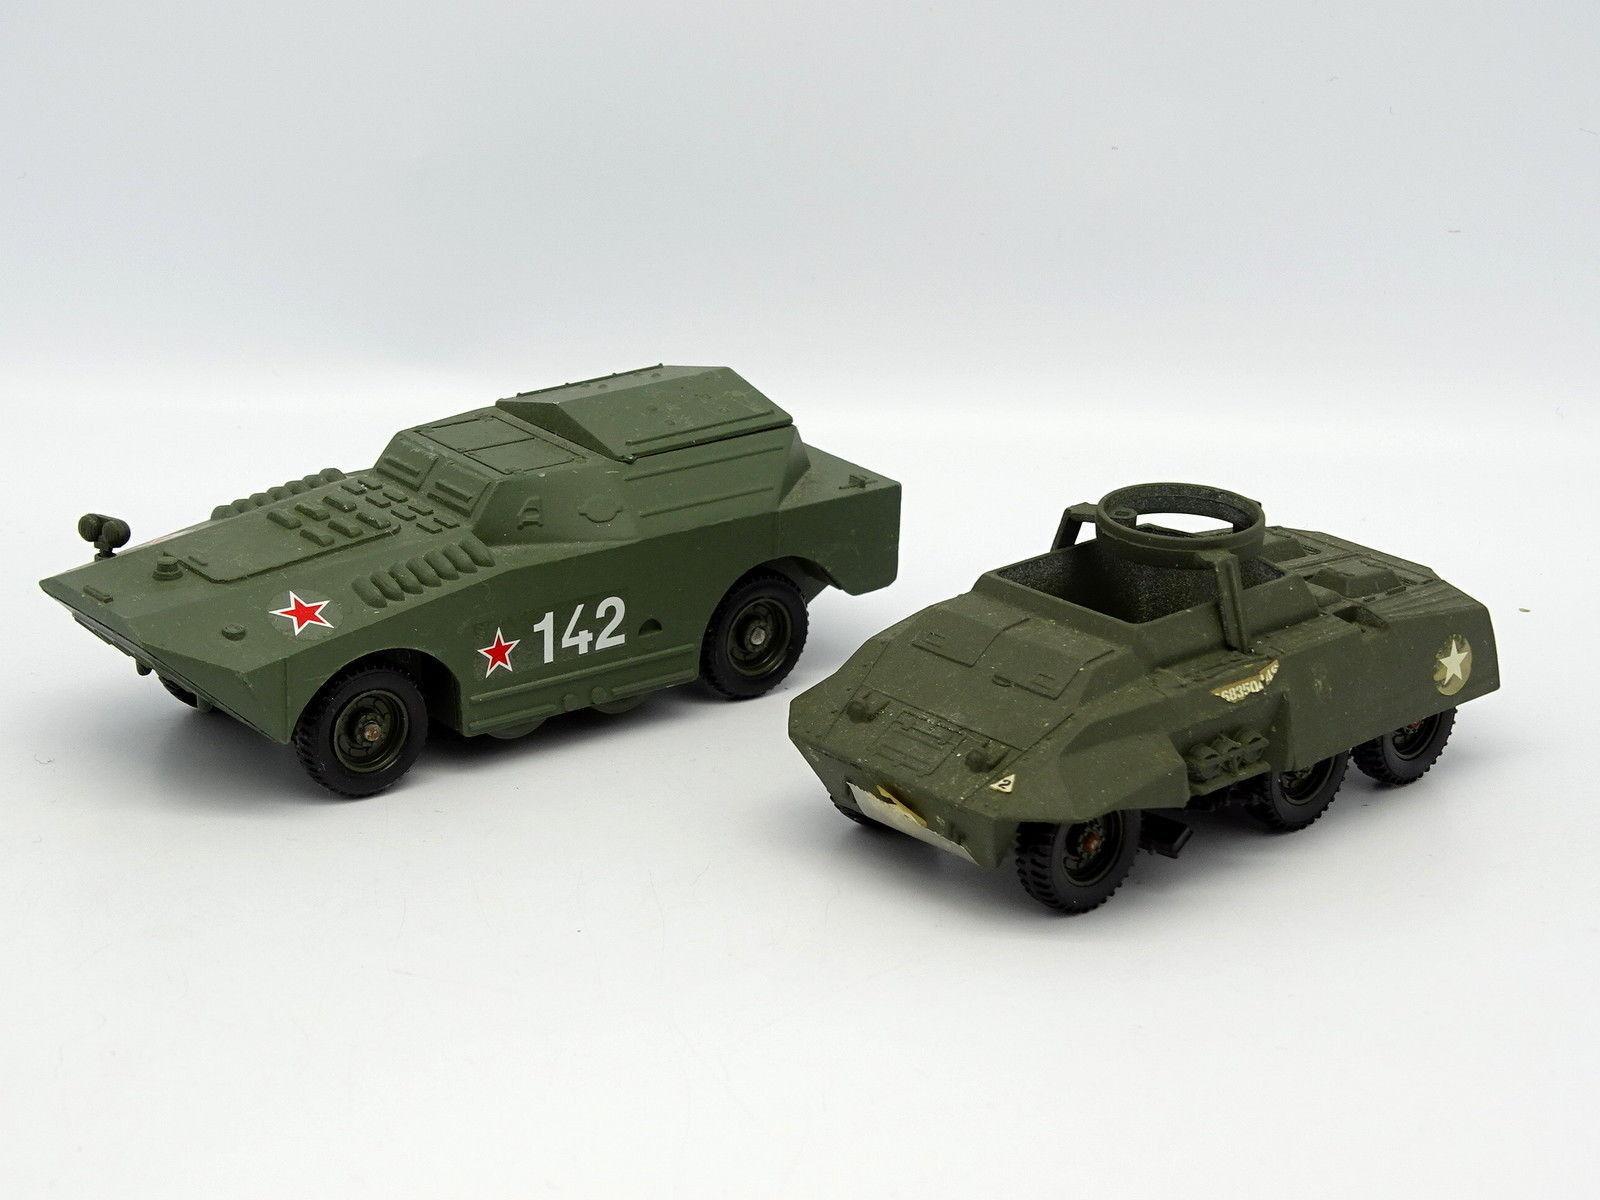 Solido Military Army SB 1 50 - - - Set of 2 Combat Car + BTR Russian 9a25e4